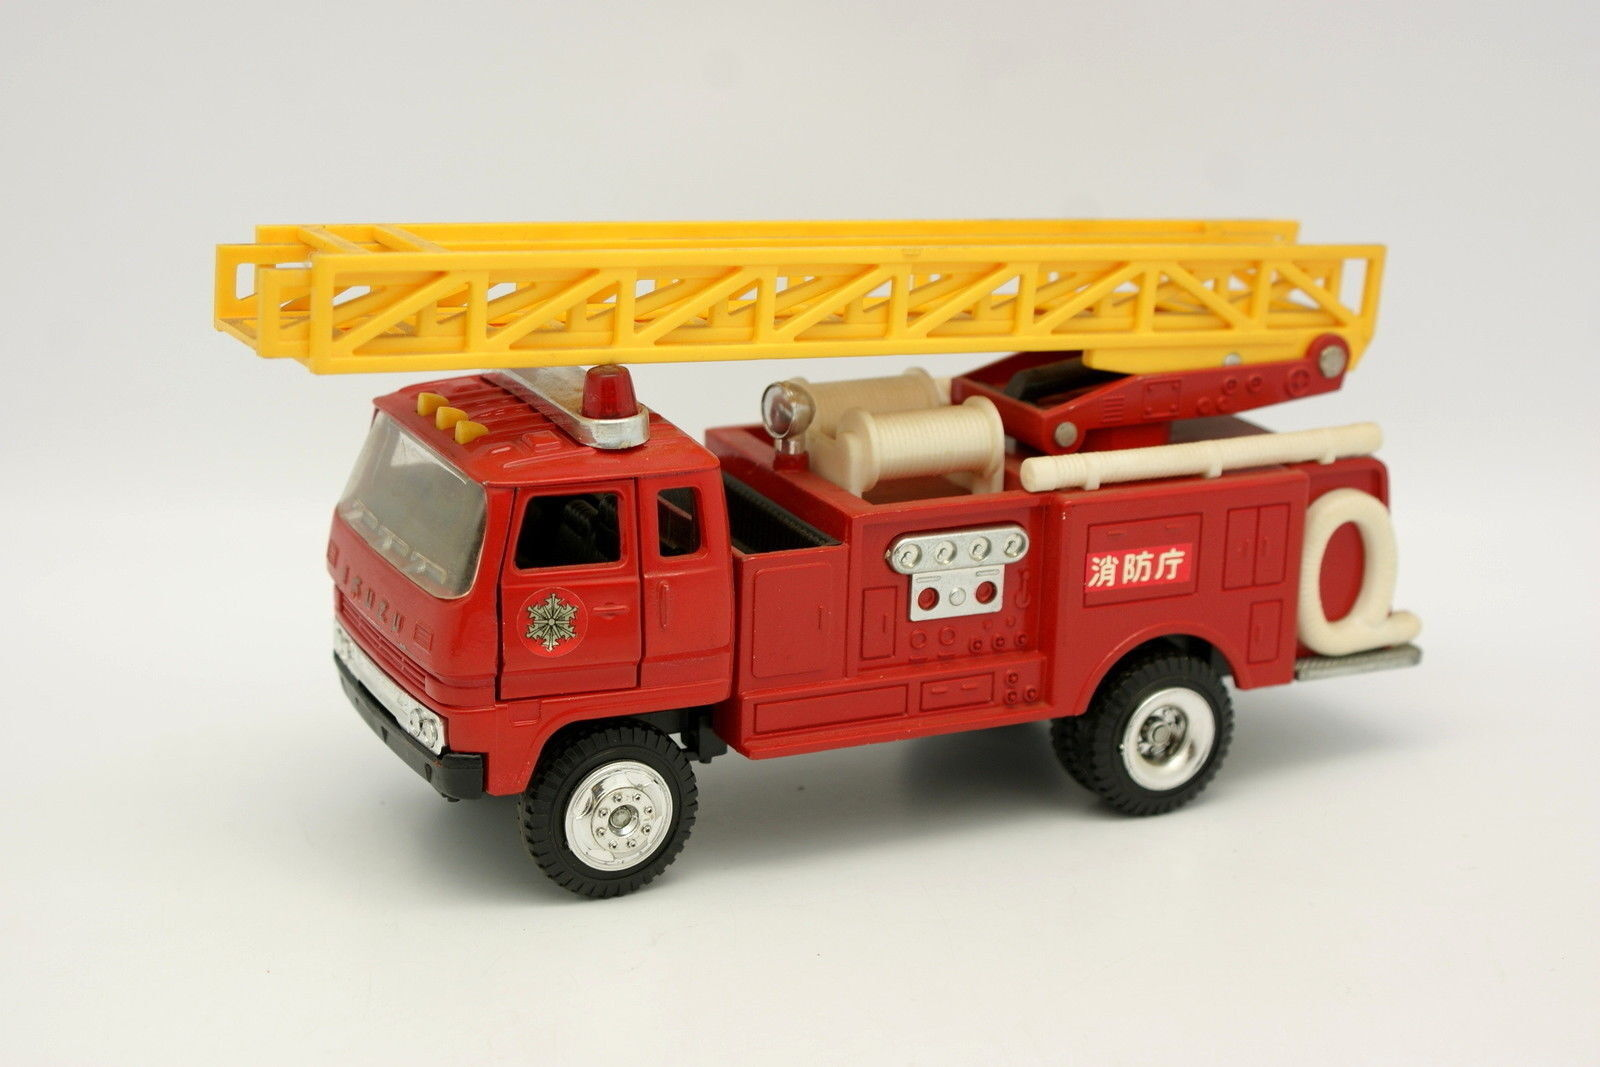 Yonezawa Diapet 1 43 1 40 - Isuzu Fire Engine Bomberos Japón